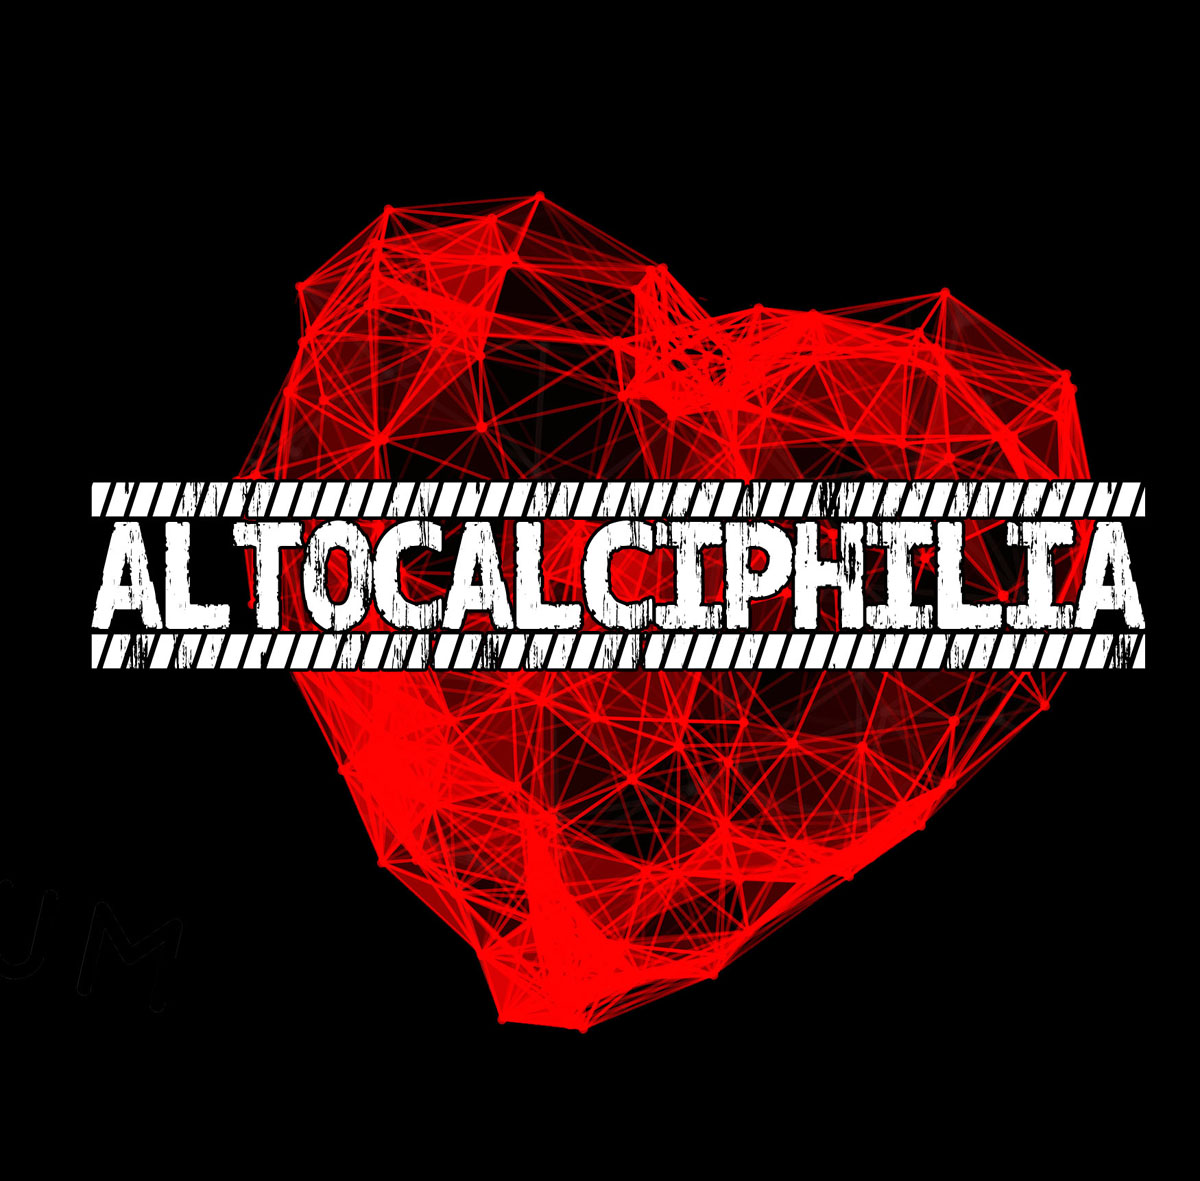 Altocalciphilia_web.jpg